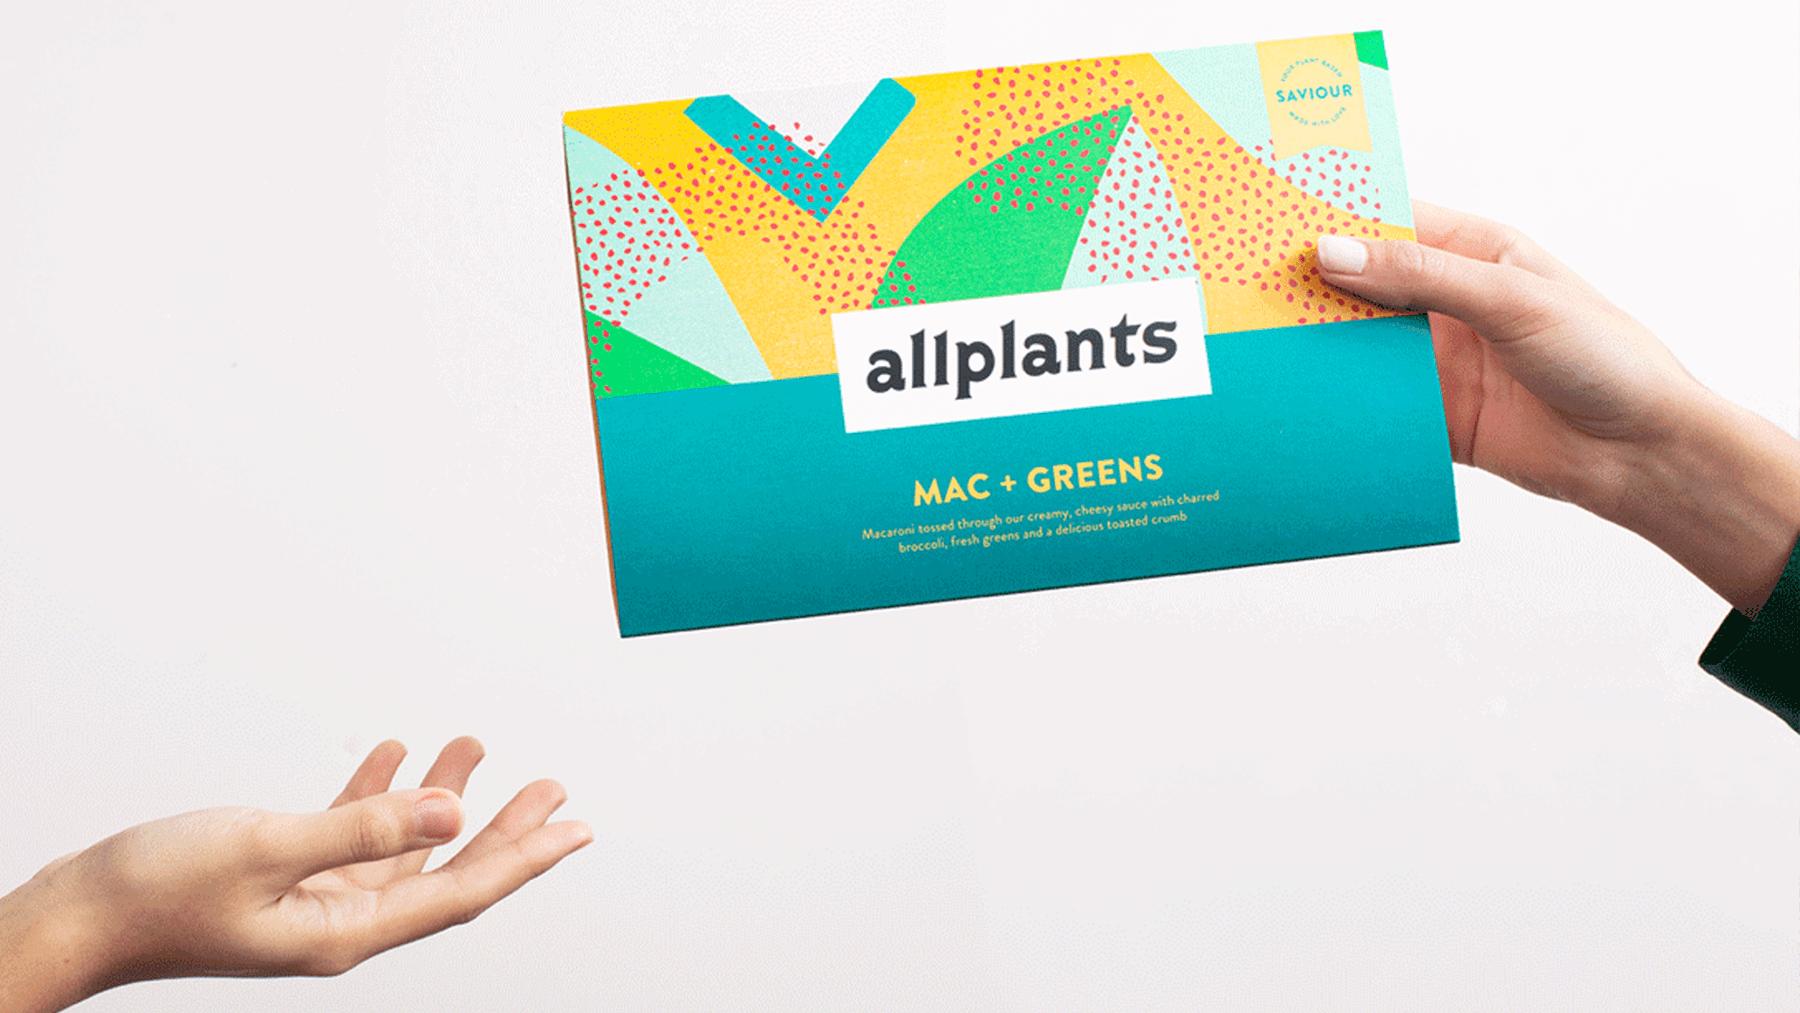 allplants-min